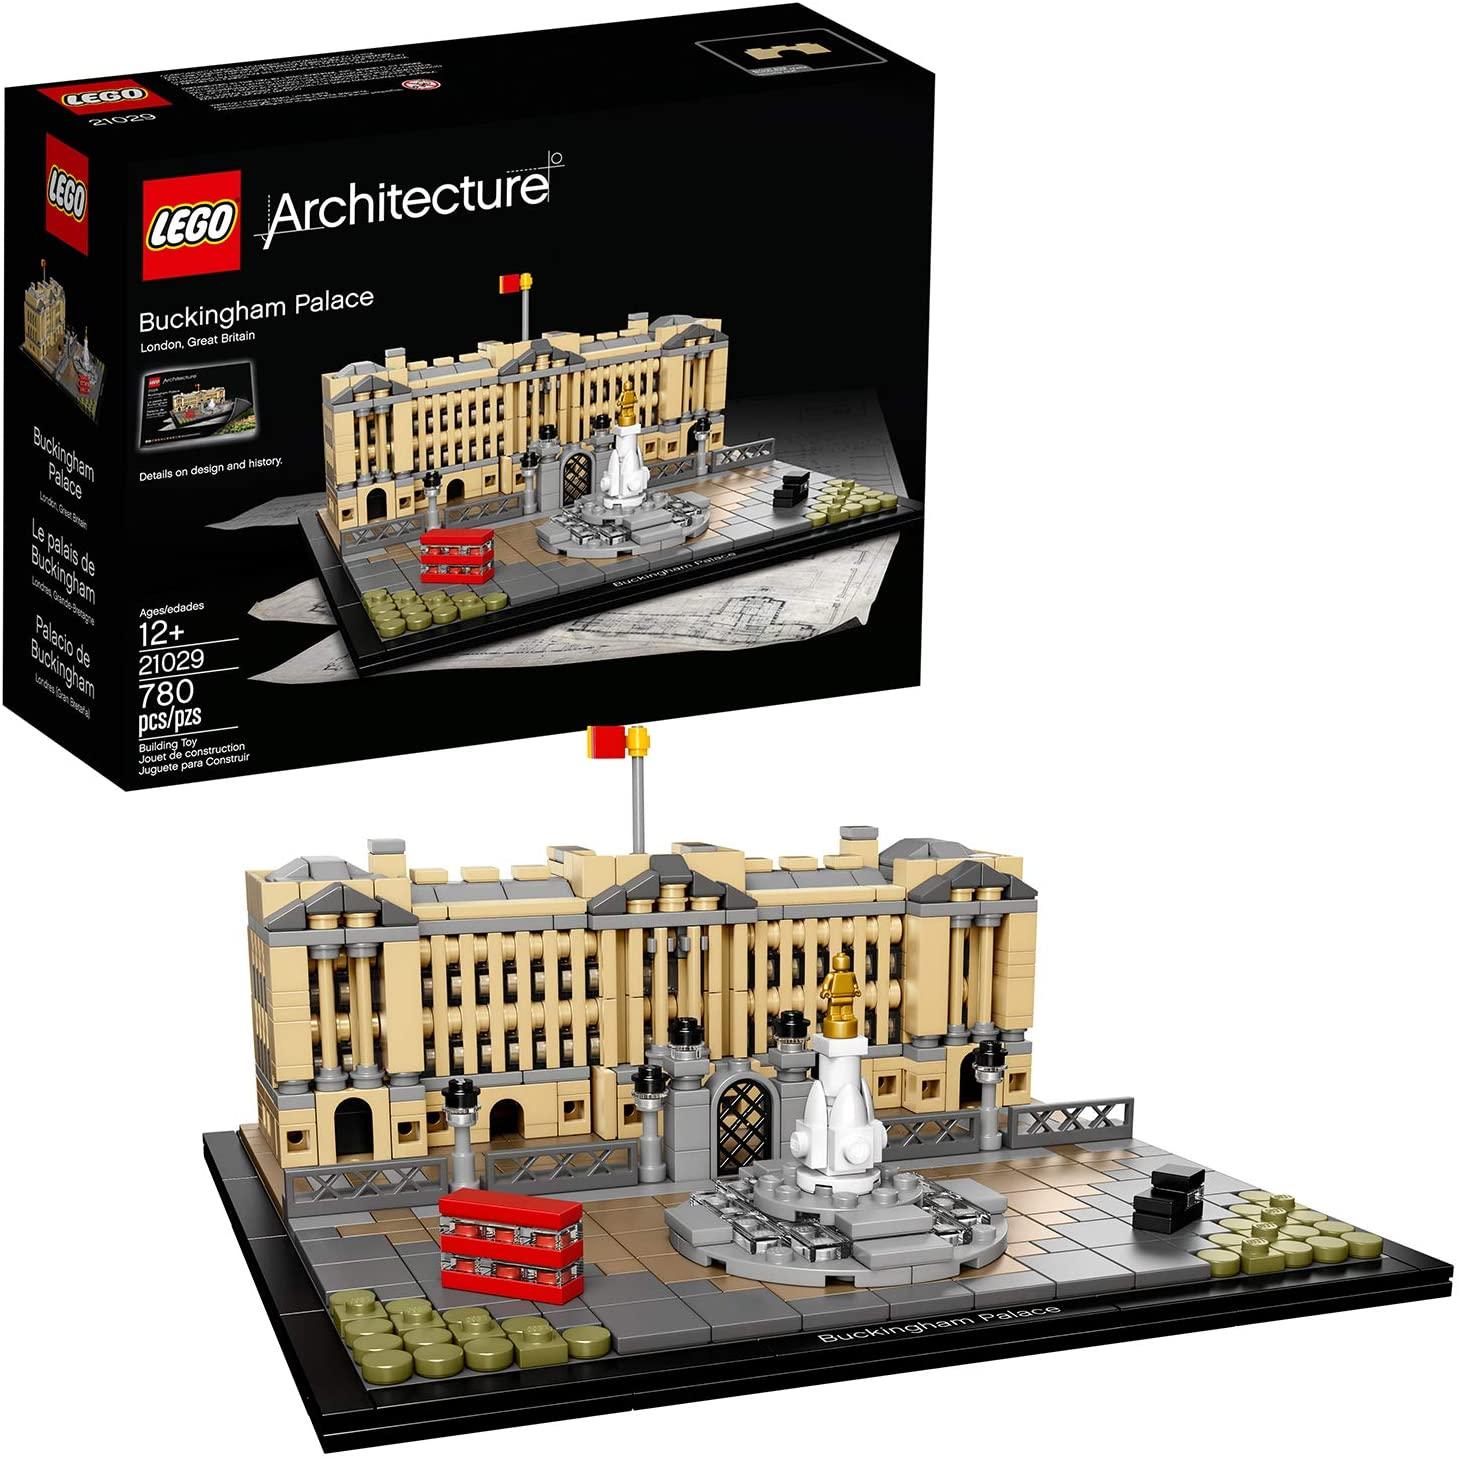 LEGO(レゴ)アーキテクチャーシリーズ「バッキンガム宮殿」の参考画像